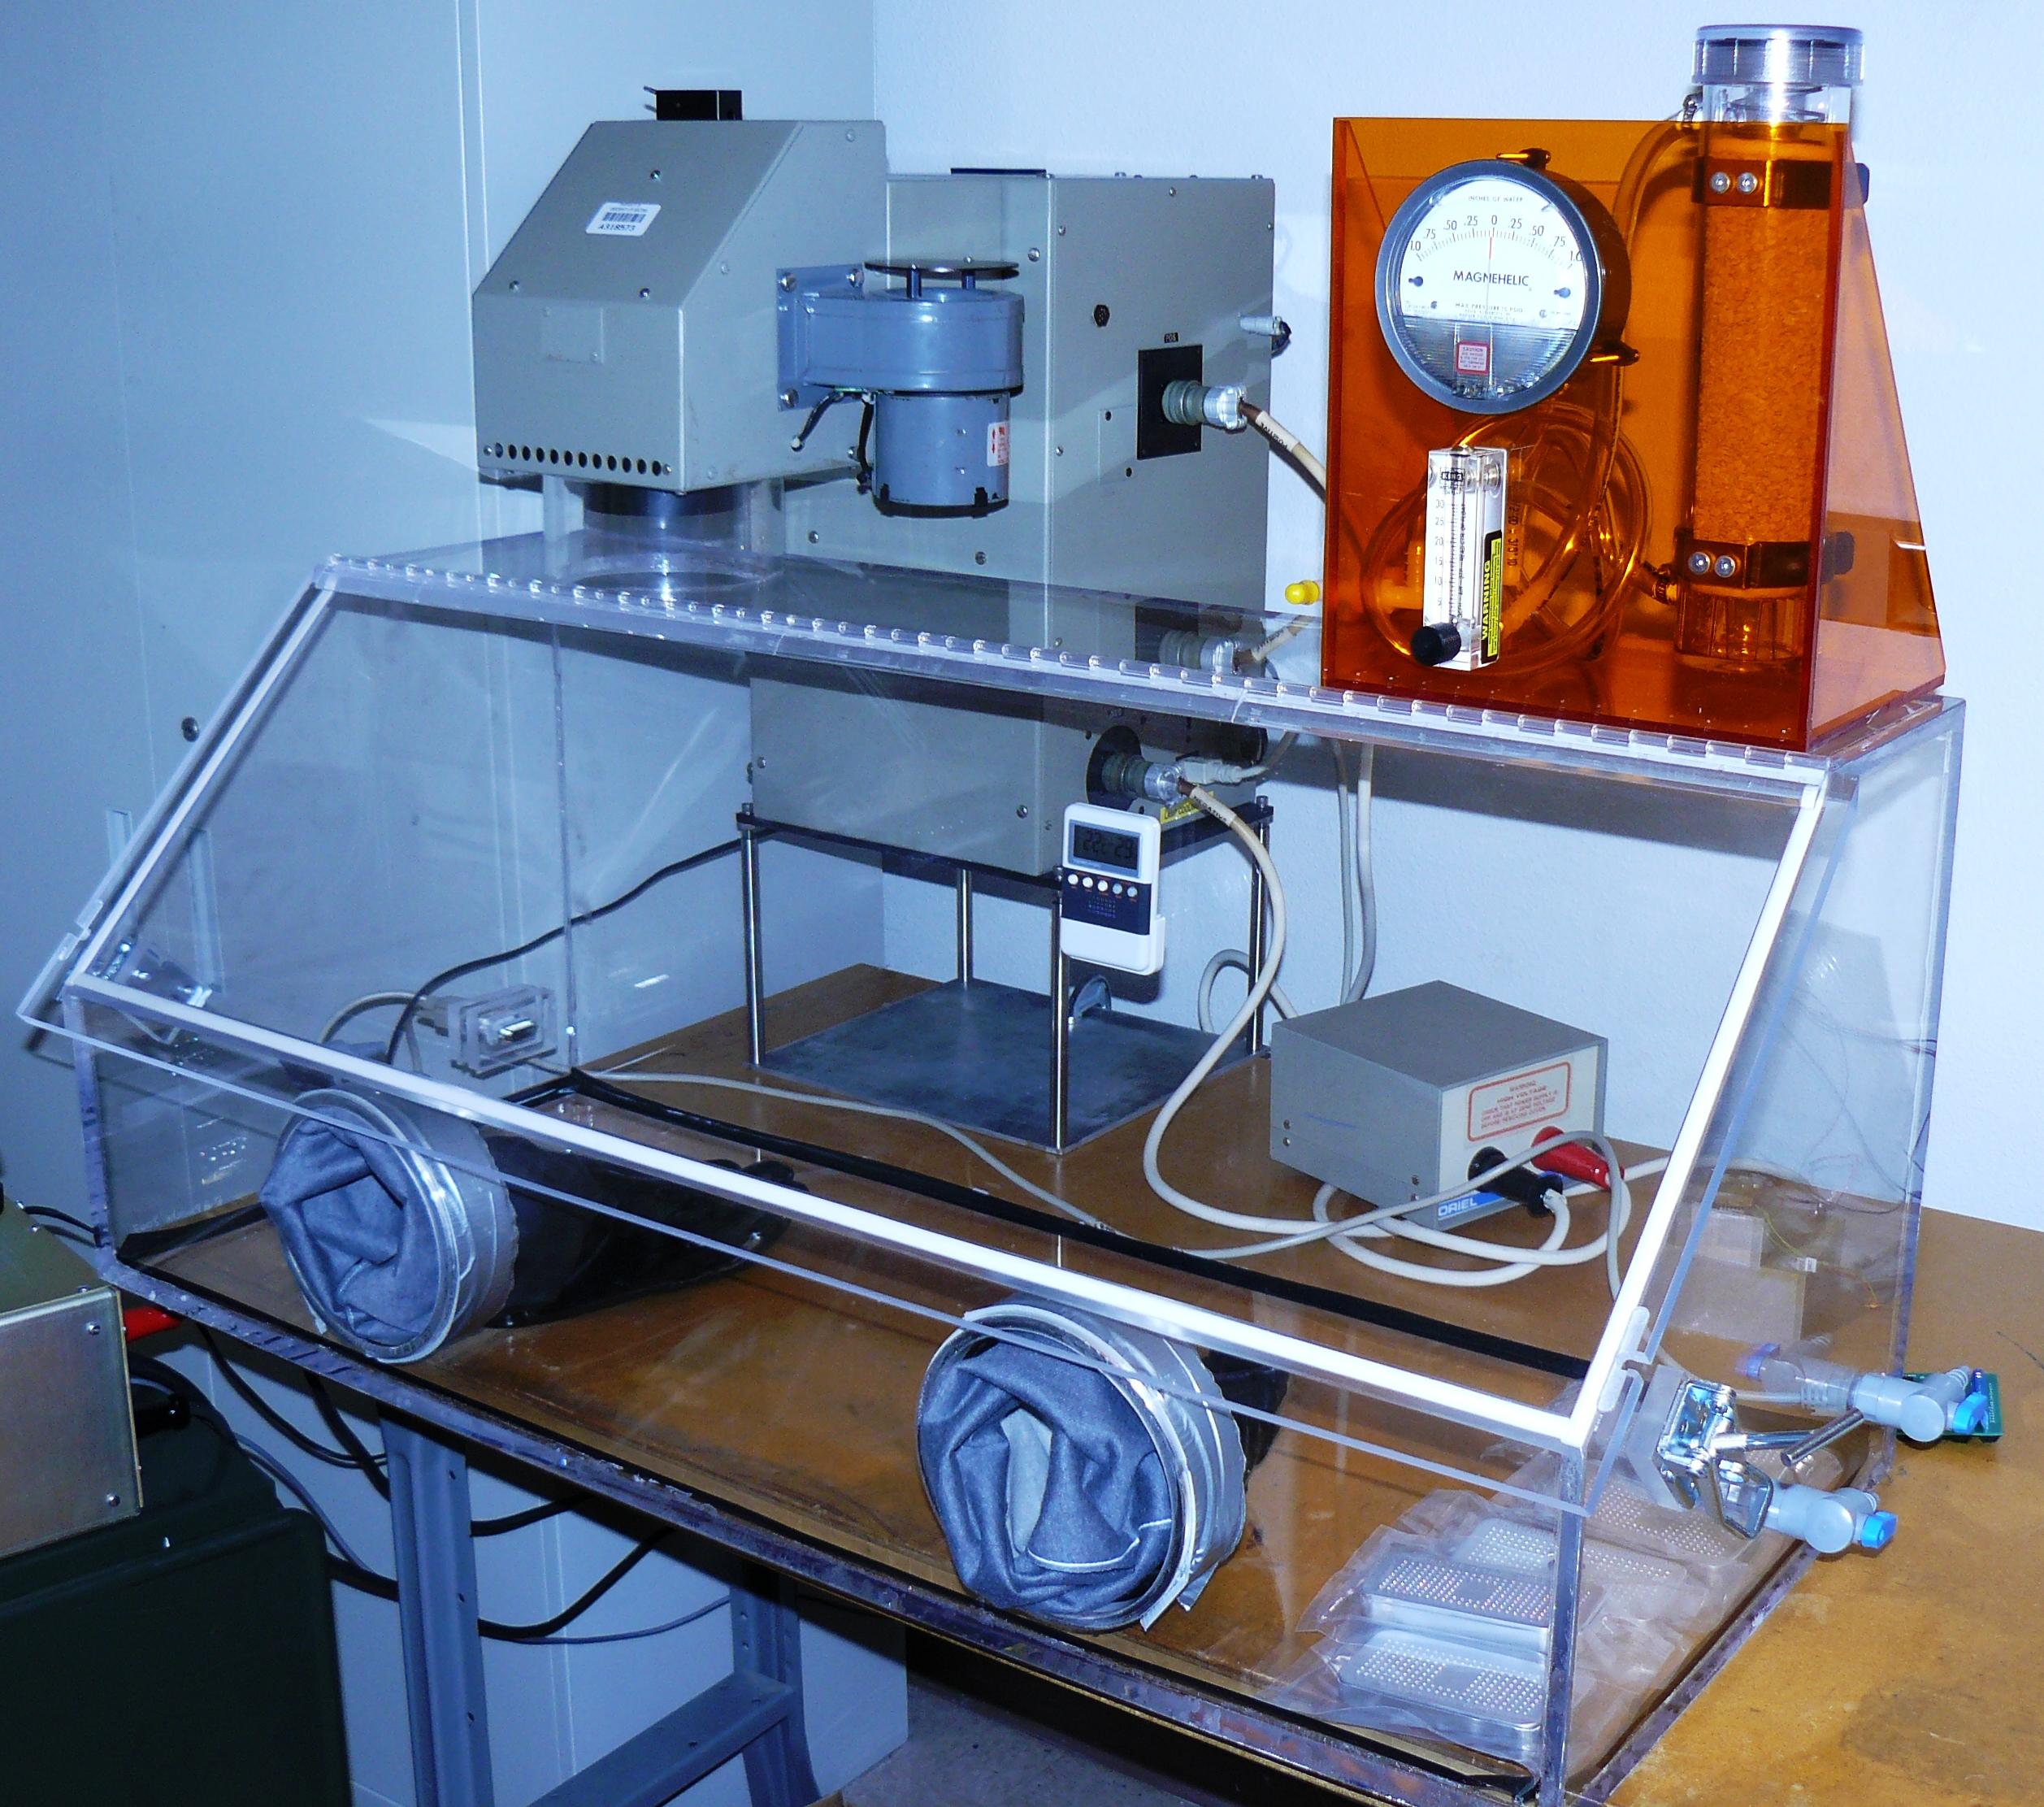 Nitrogen Glovebox -Buy Quality Products Online